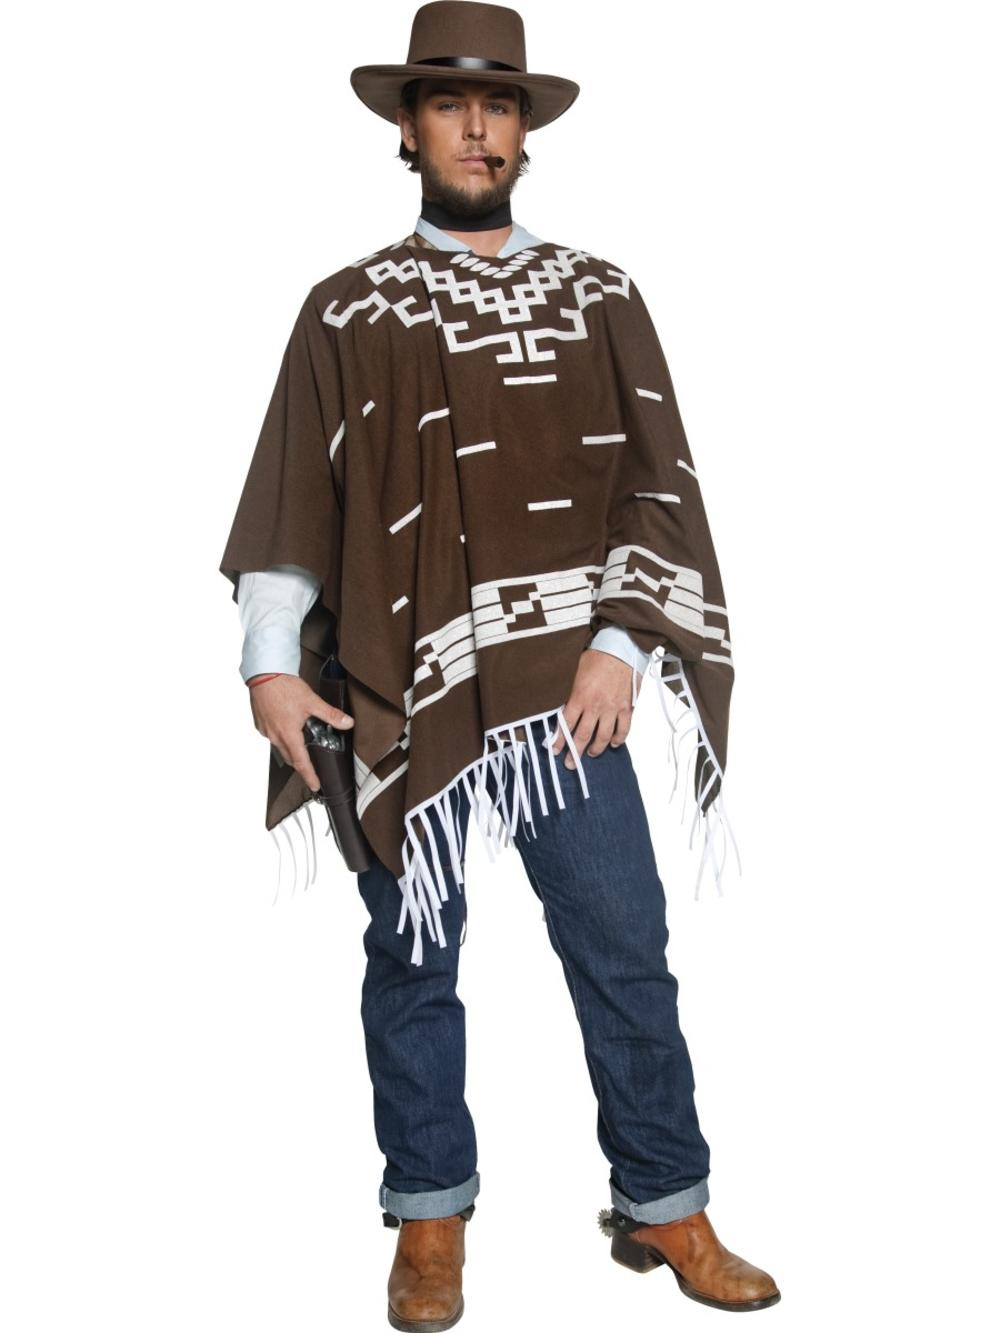 Wild Western Wandering Gunman Mens Fancy Dress Rodeo Cowboy Adult Costume Outfit